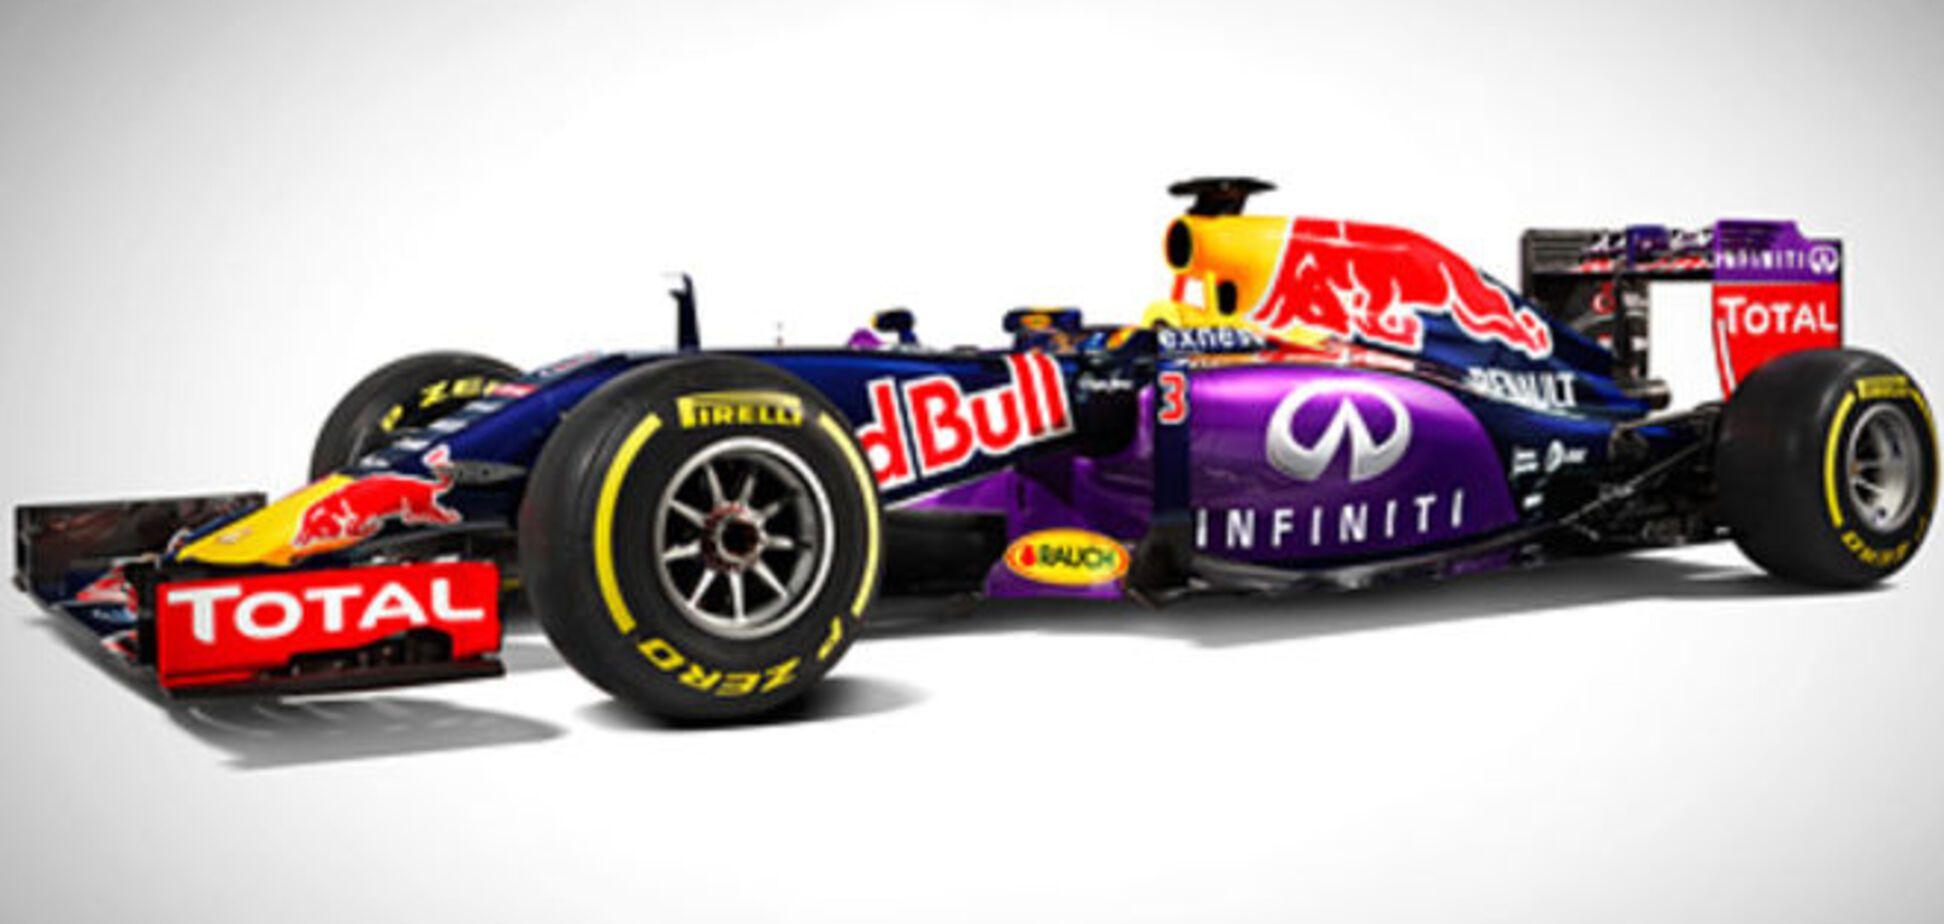 Red Bull представил долгожданный болид 2015 года: фото новинки